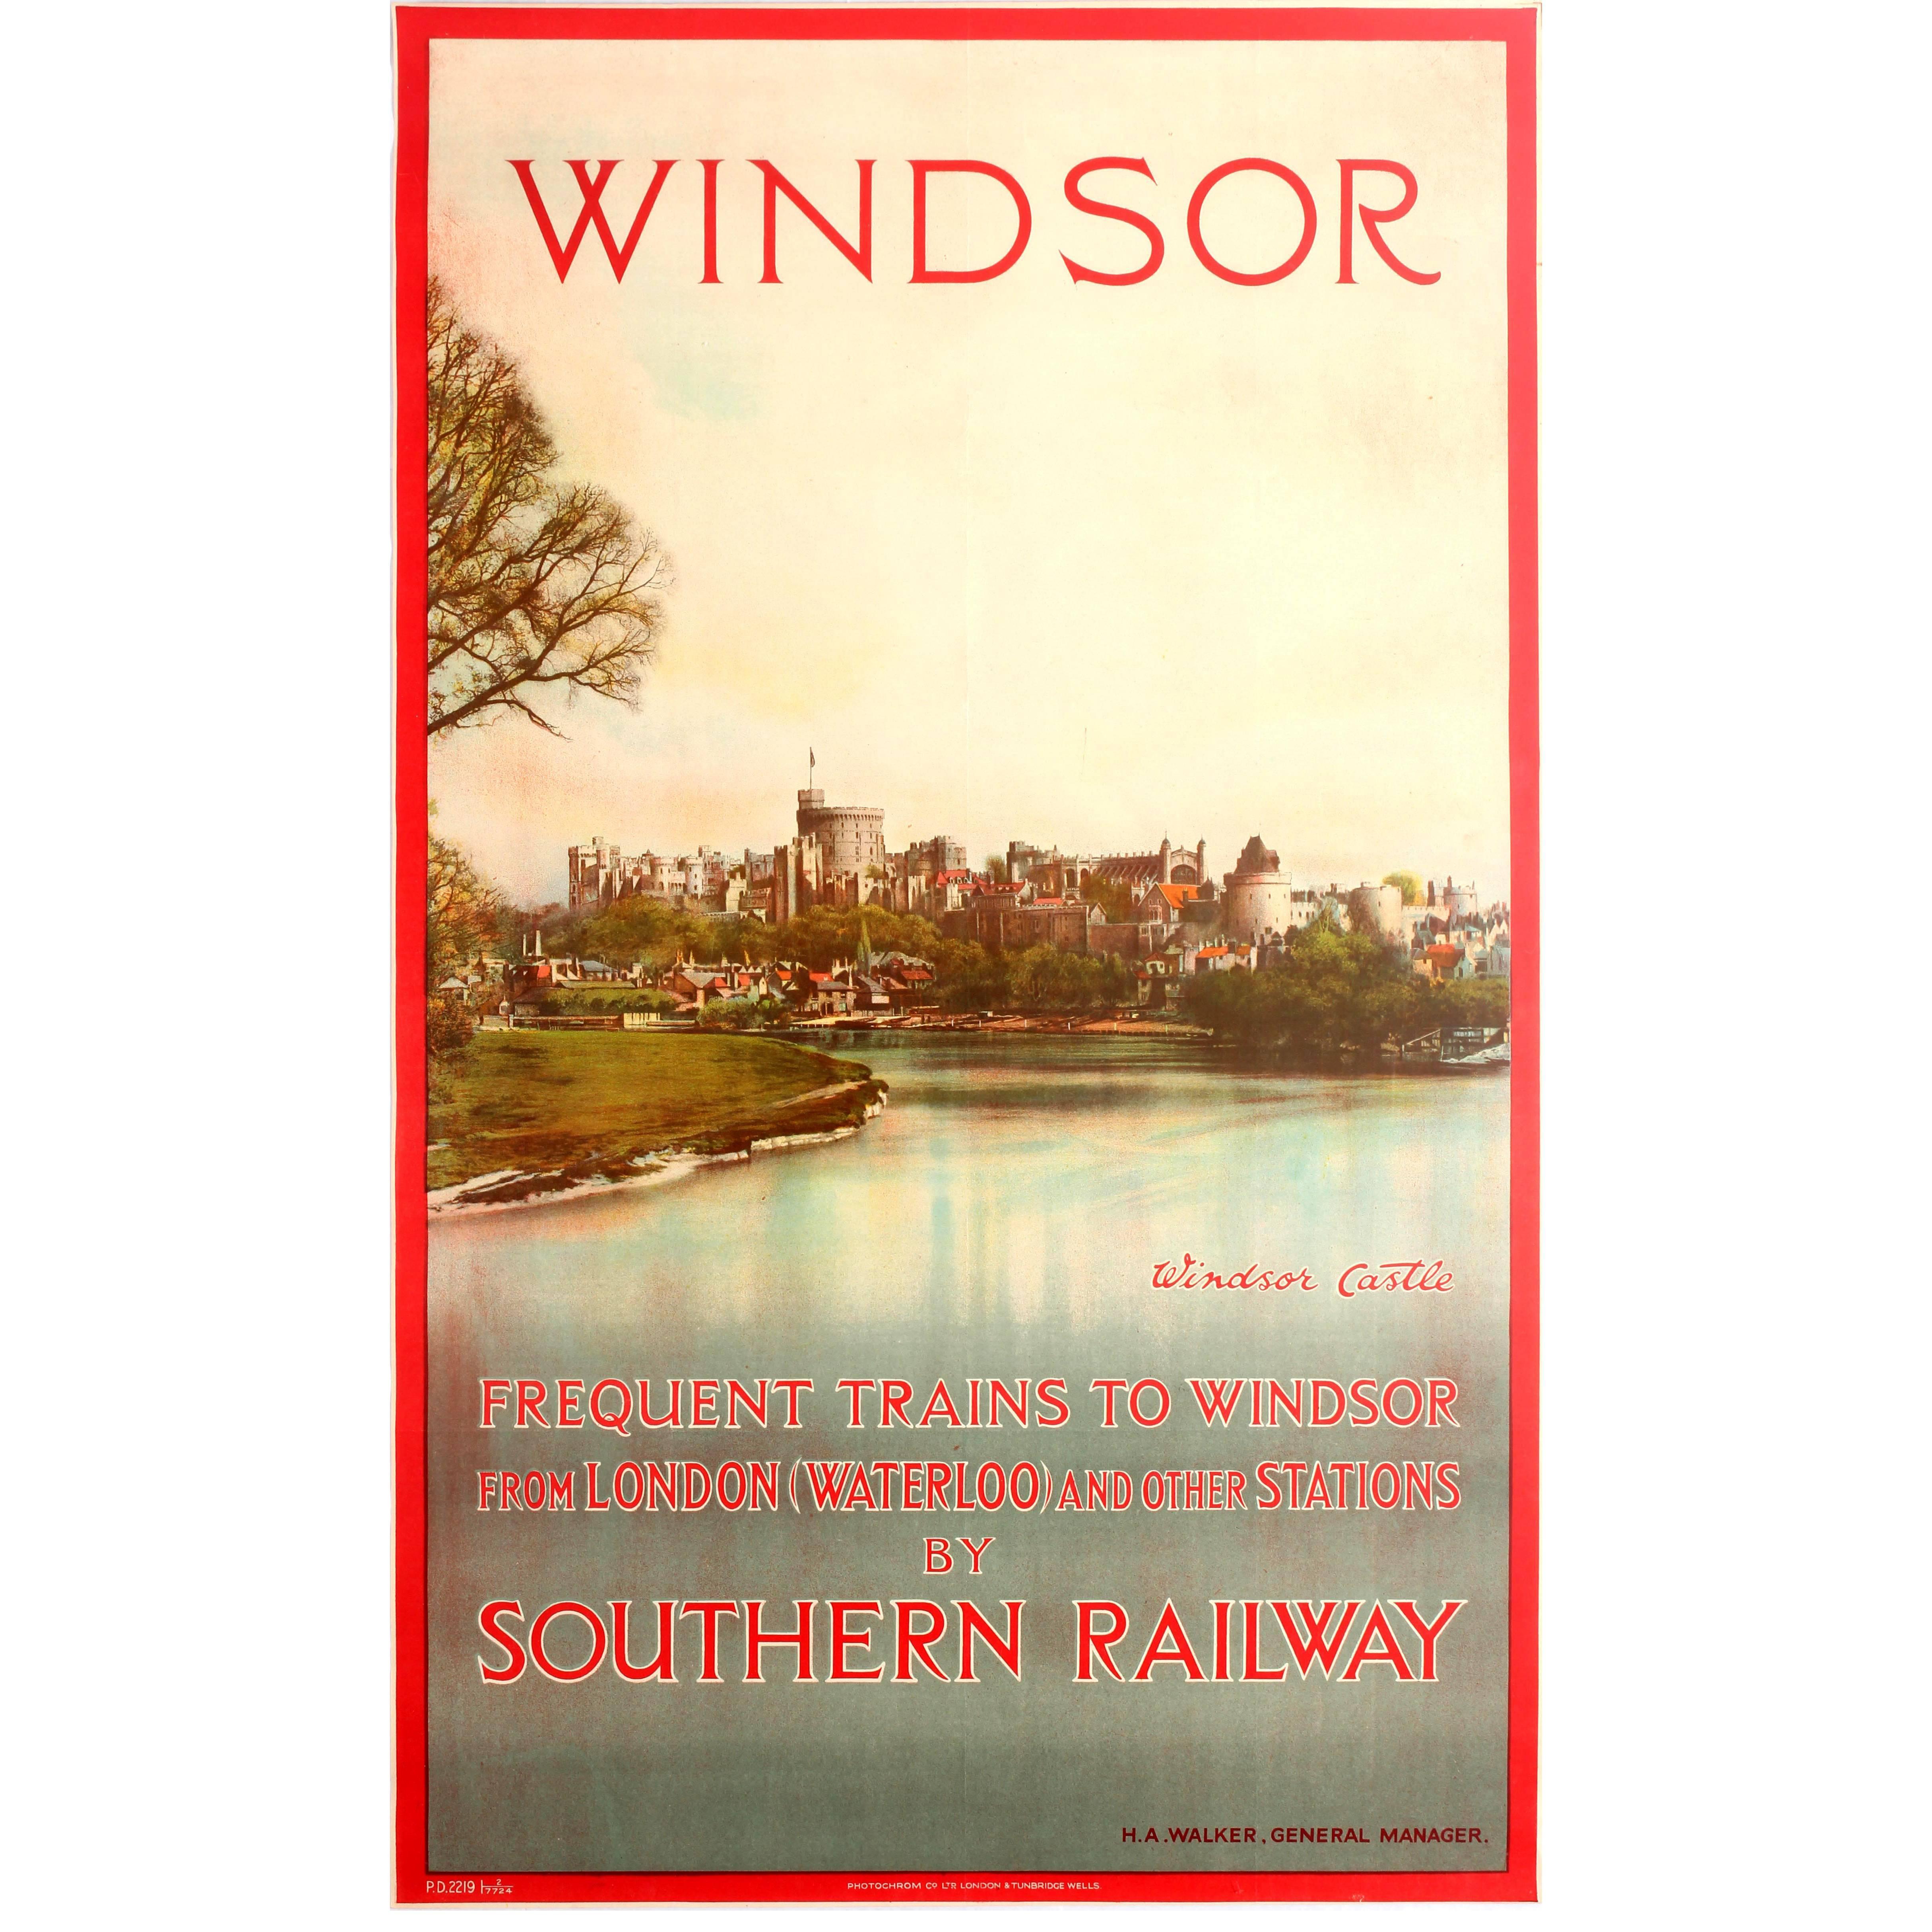 Original Vintage Southern Railway Travel Poster Featuring Windsor Castle England